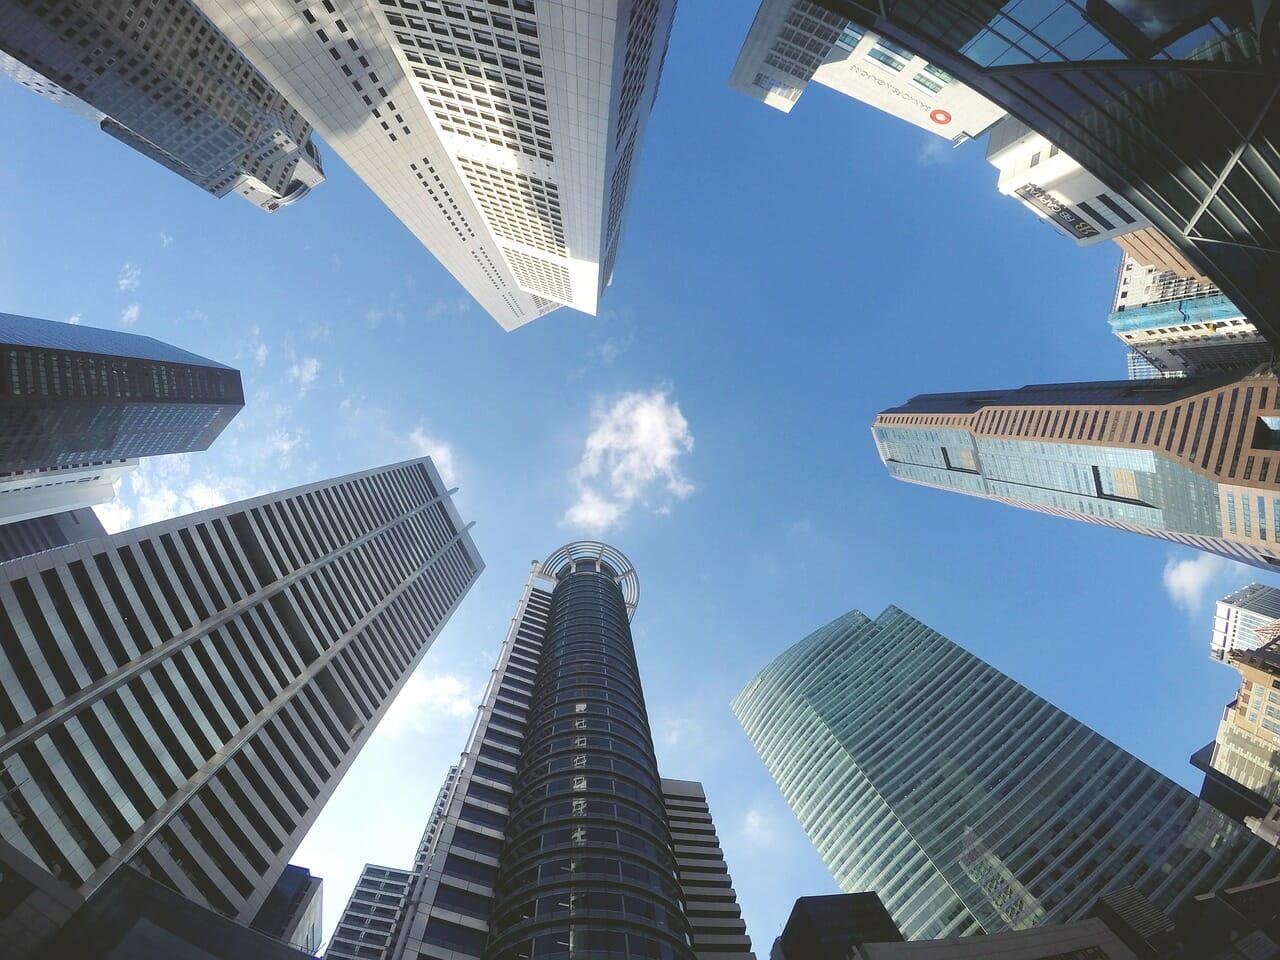 List of Real Estate Employment Agencies for Job Seekers - JobStars